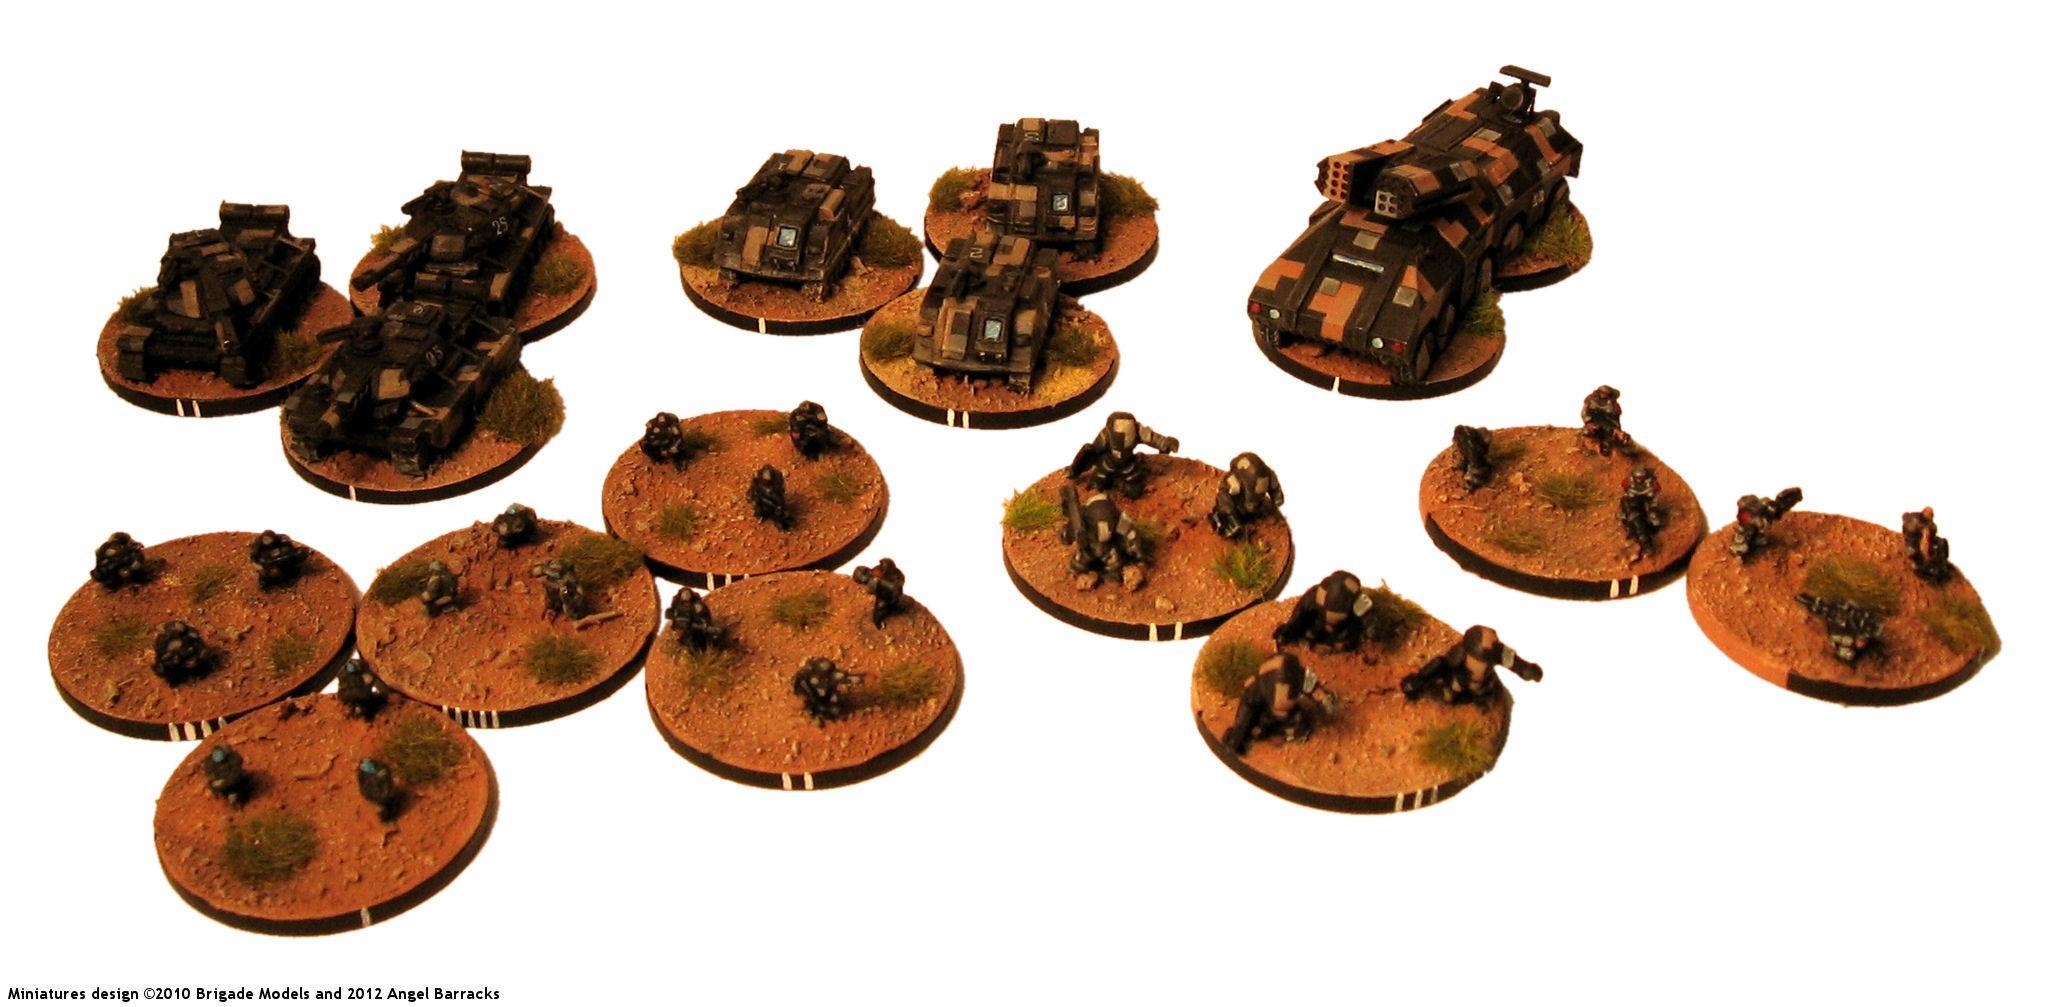 6mm, Airframe, Angel, Army, Barracks, Battlegroup, Brigade, Mechawar, Models, Omega, One, Pound, Precinct, Wargames